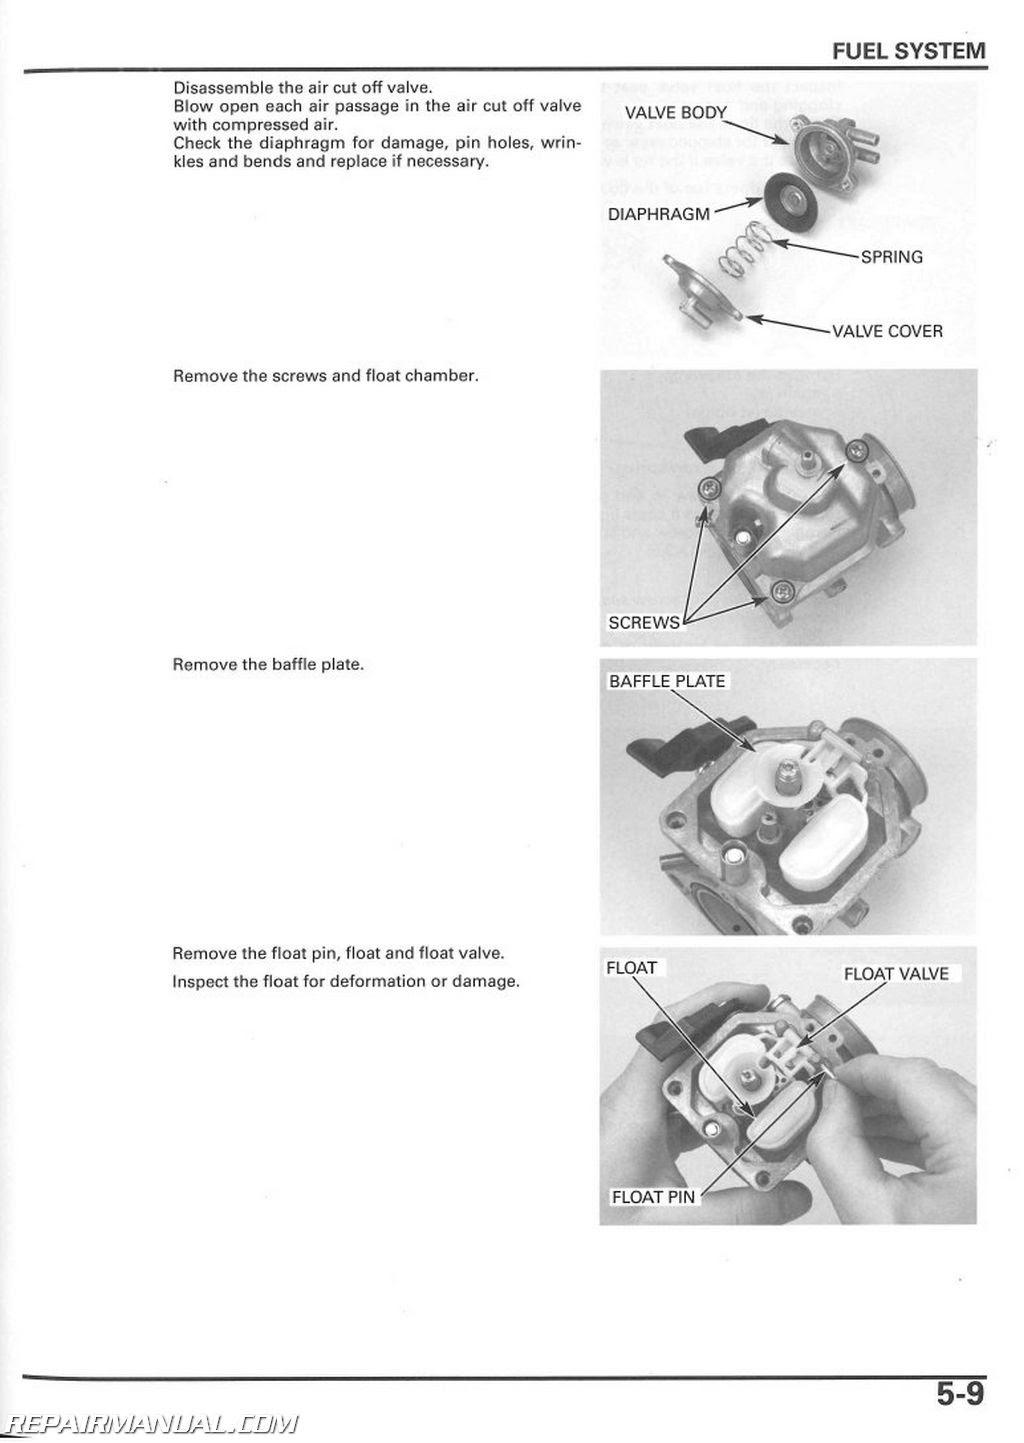 2017 Honda Generator Schematics 2005 2014 Trx250te Tm Recon Service Manual